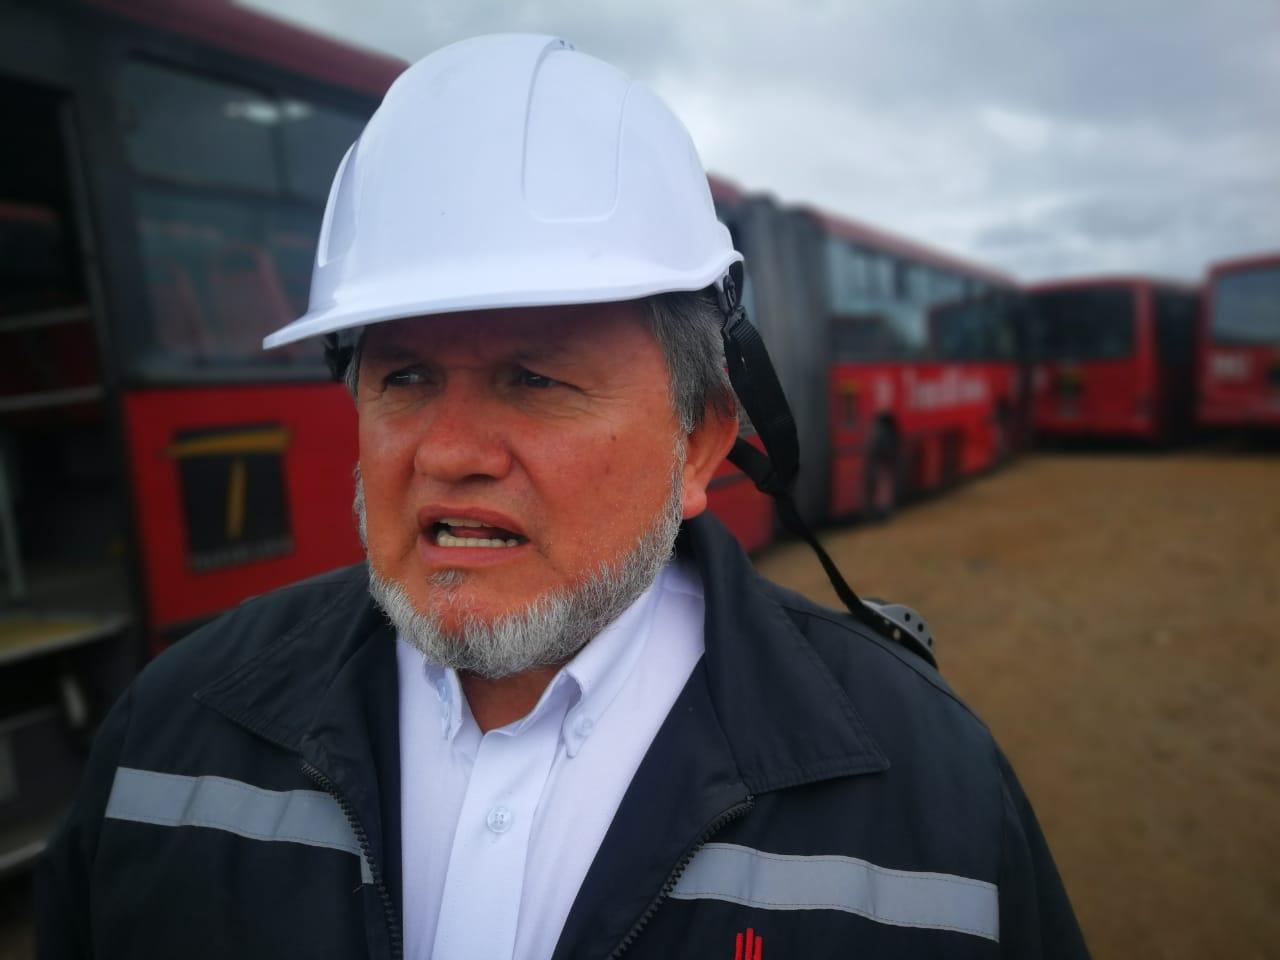 Jacobo Pulido González, Director Administrativo de la Siderúrgica Nacional, Sidenal